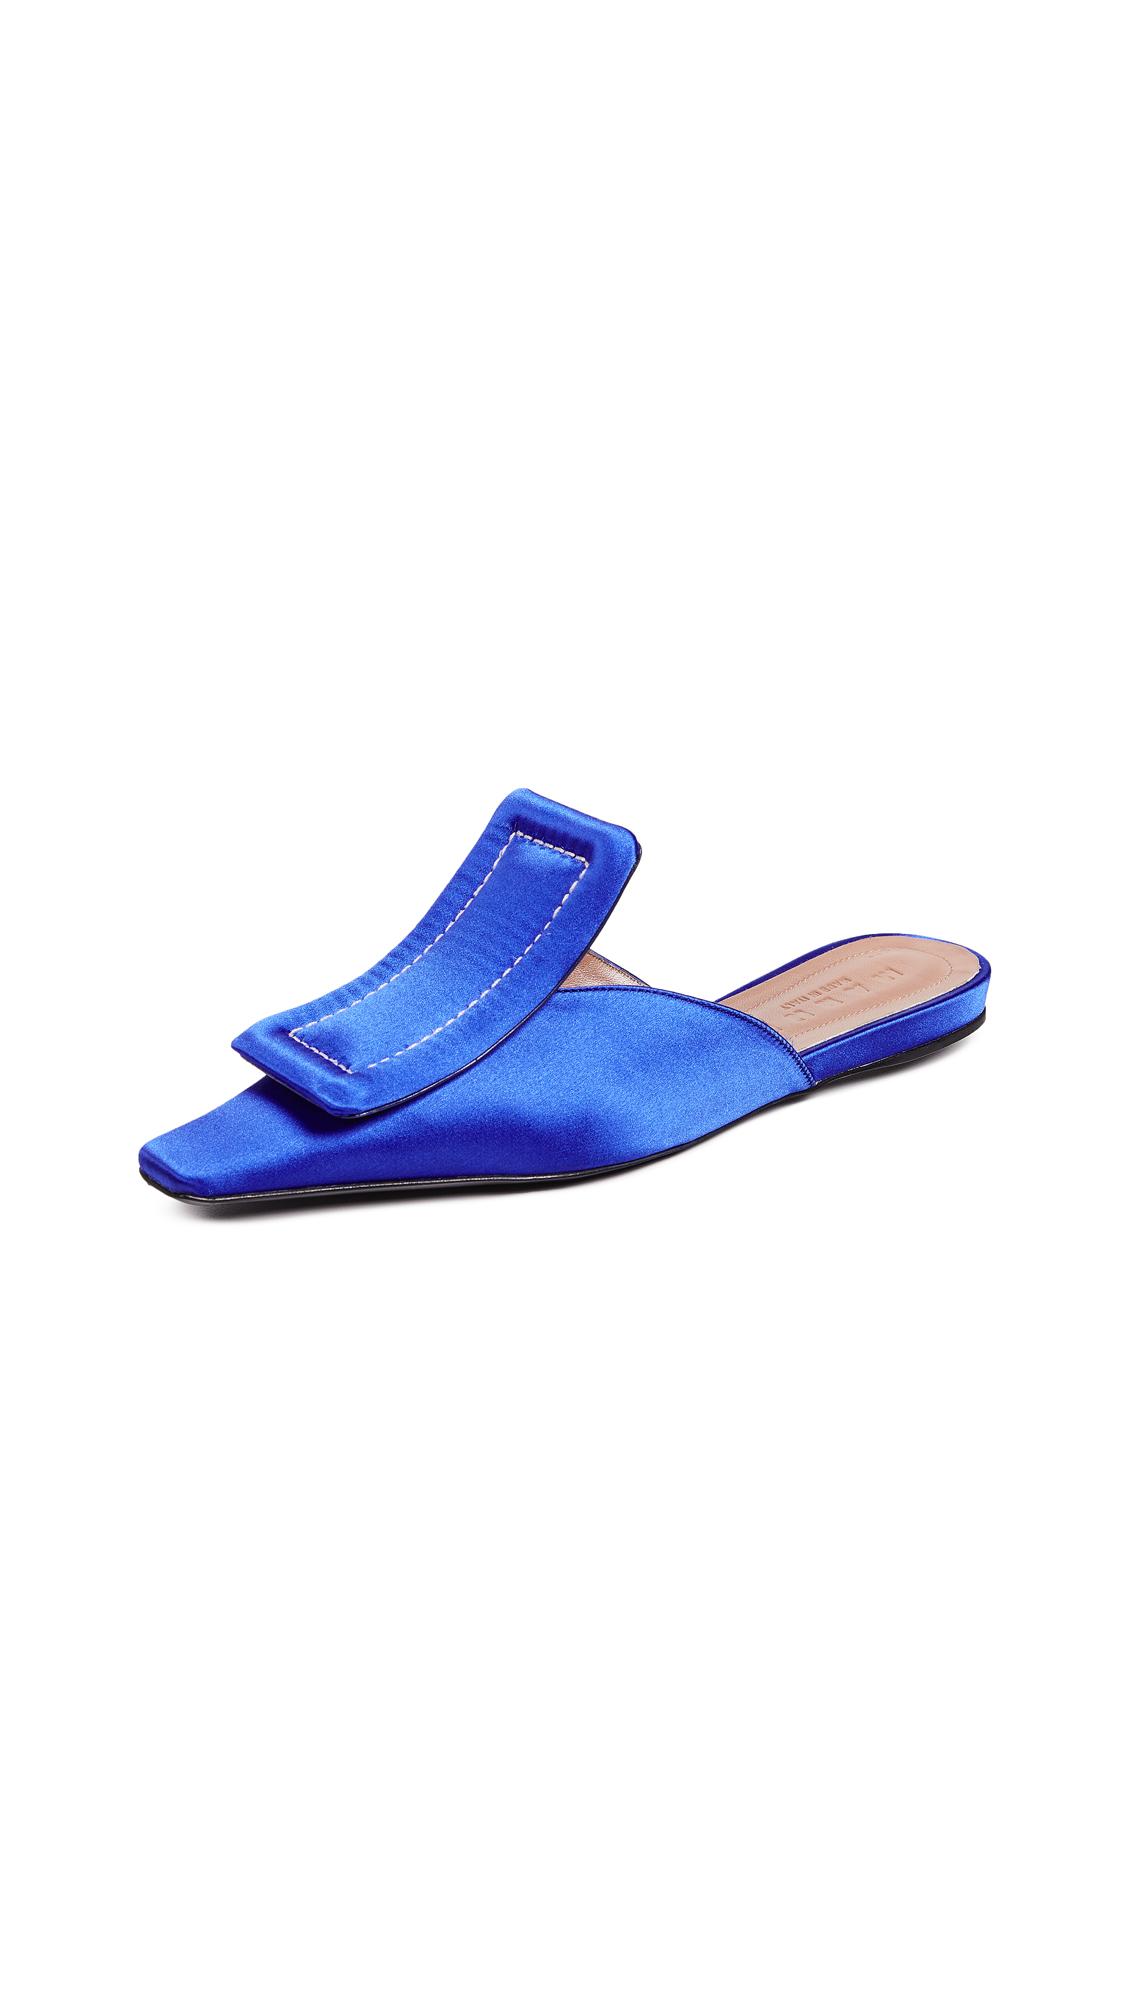 Marni Sabot Mules - Bluette